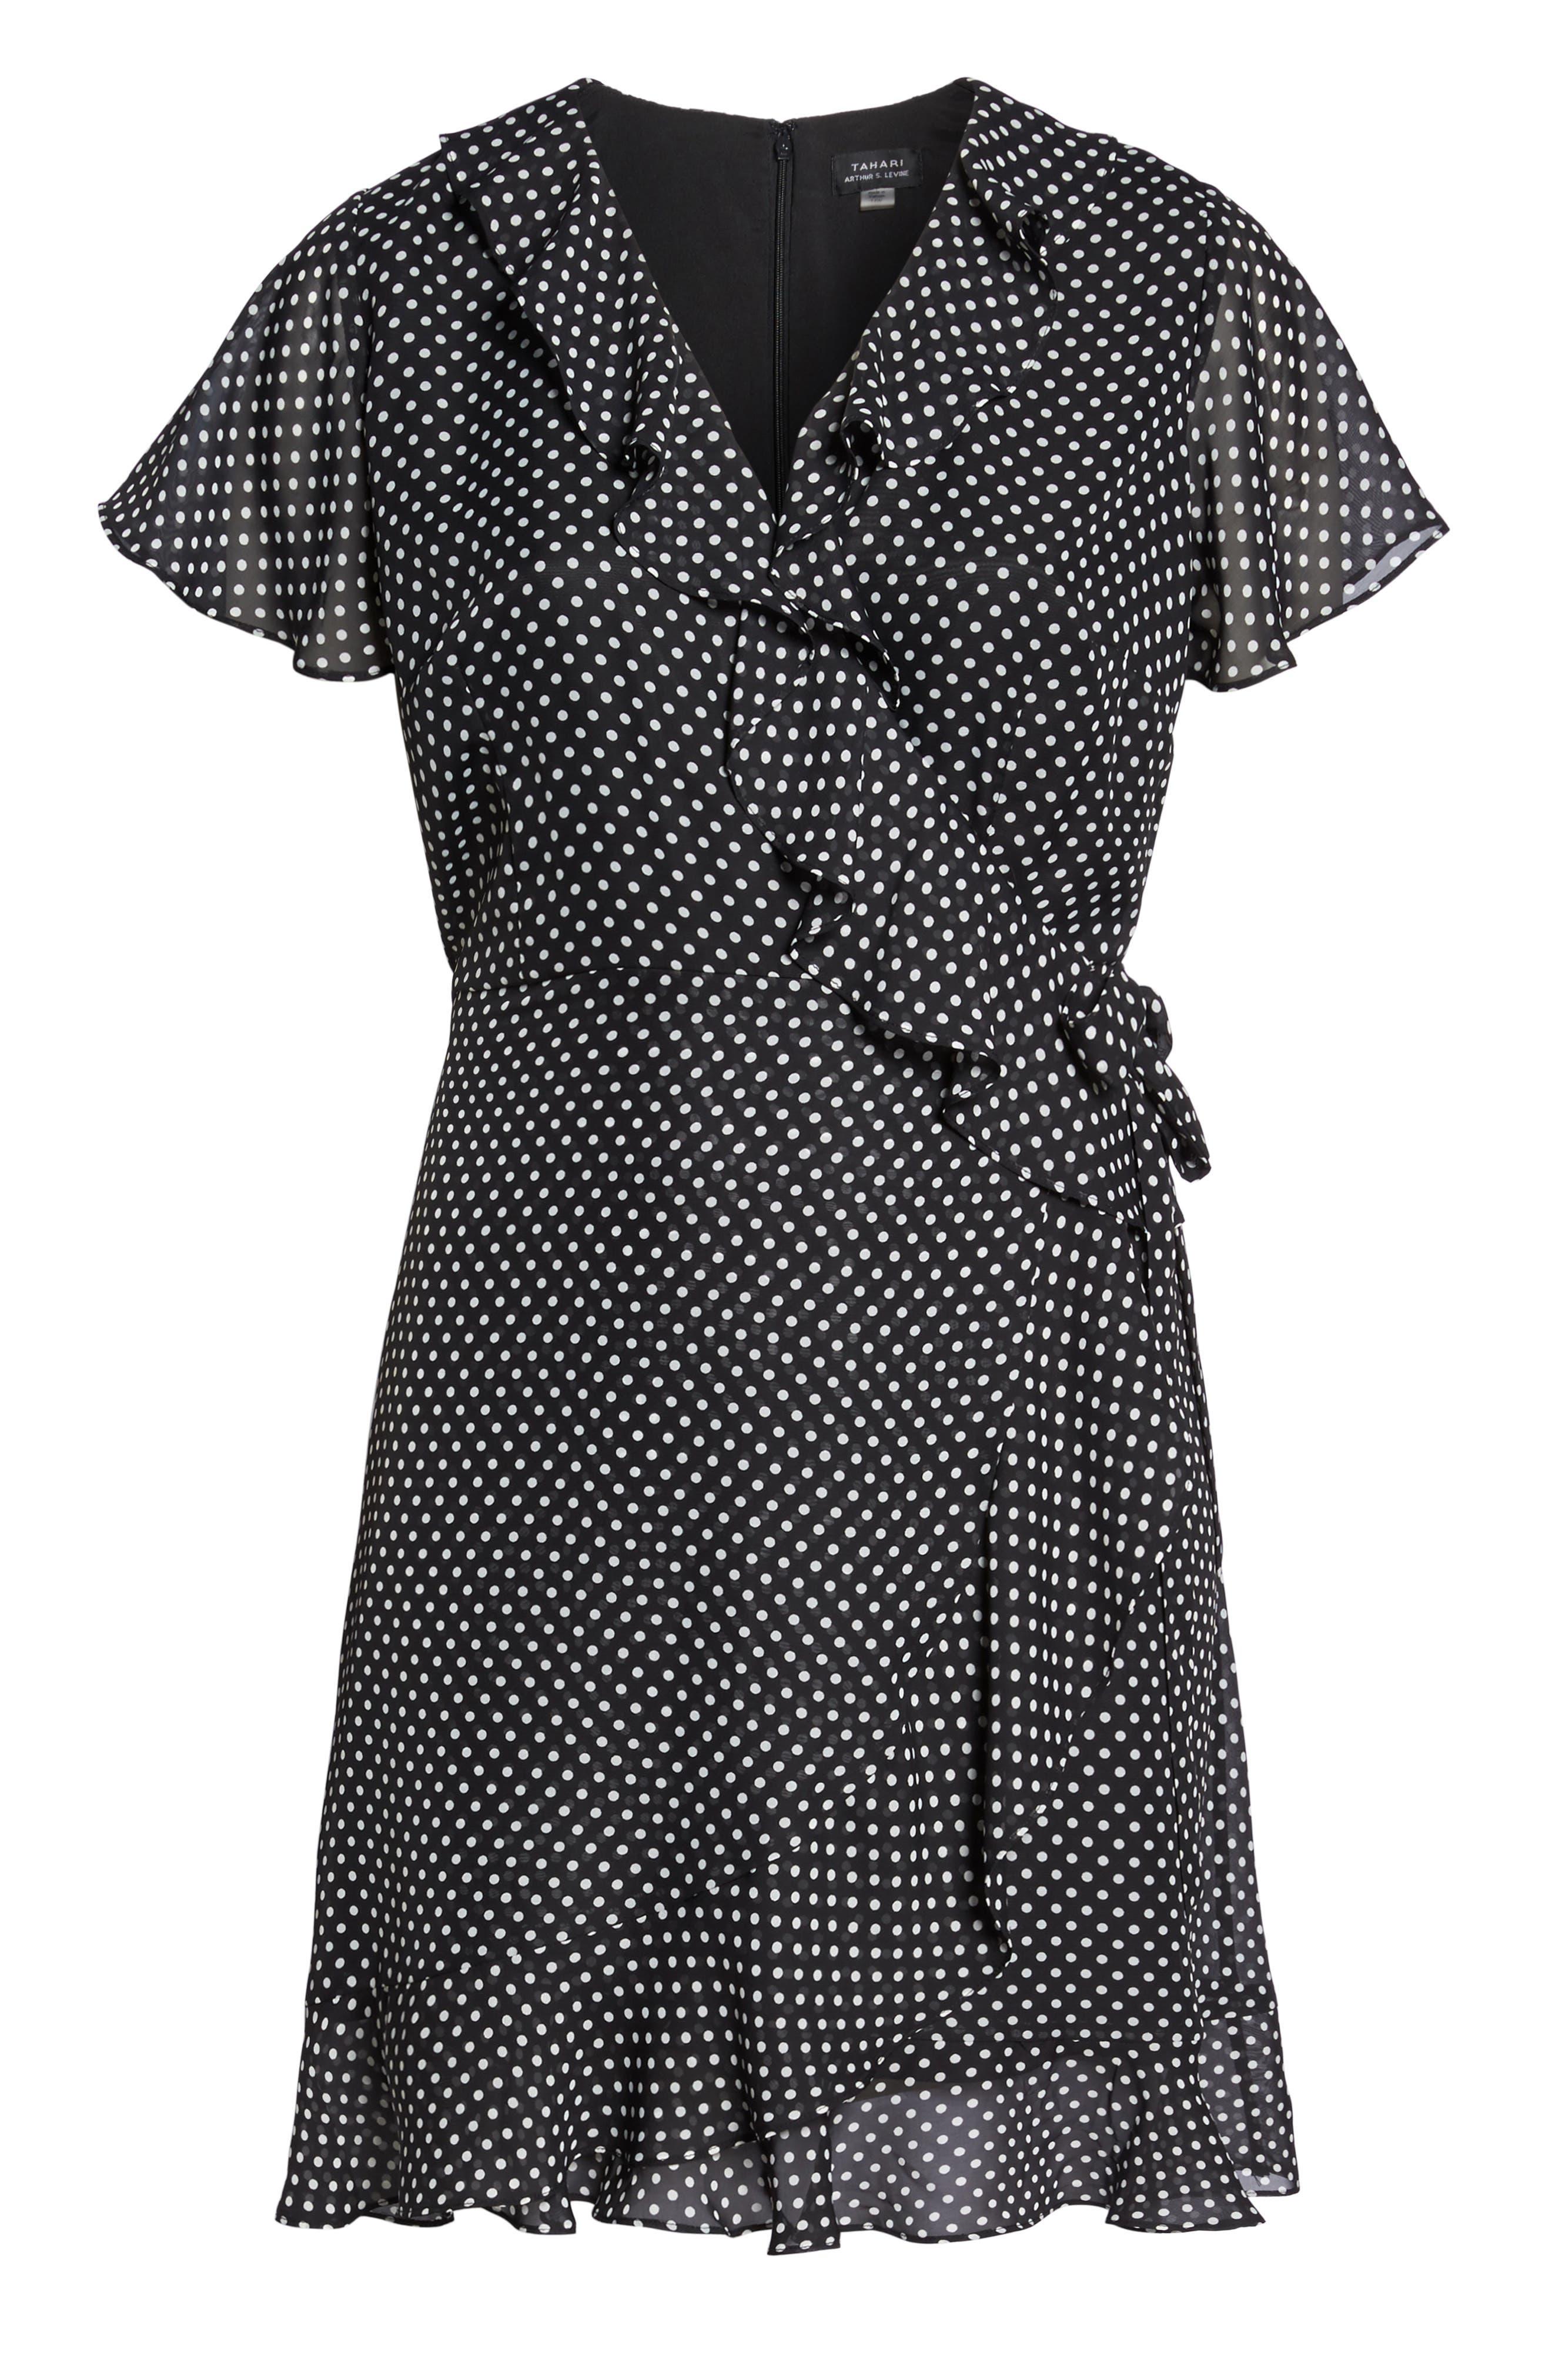 Polka Dot Faux Wrap Ruffle Dress,                             Alternate thumbnail 6, color,                             Black/ Ivory